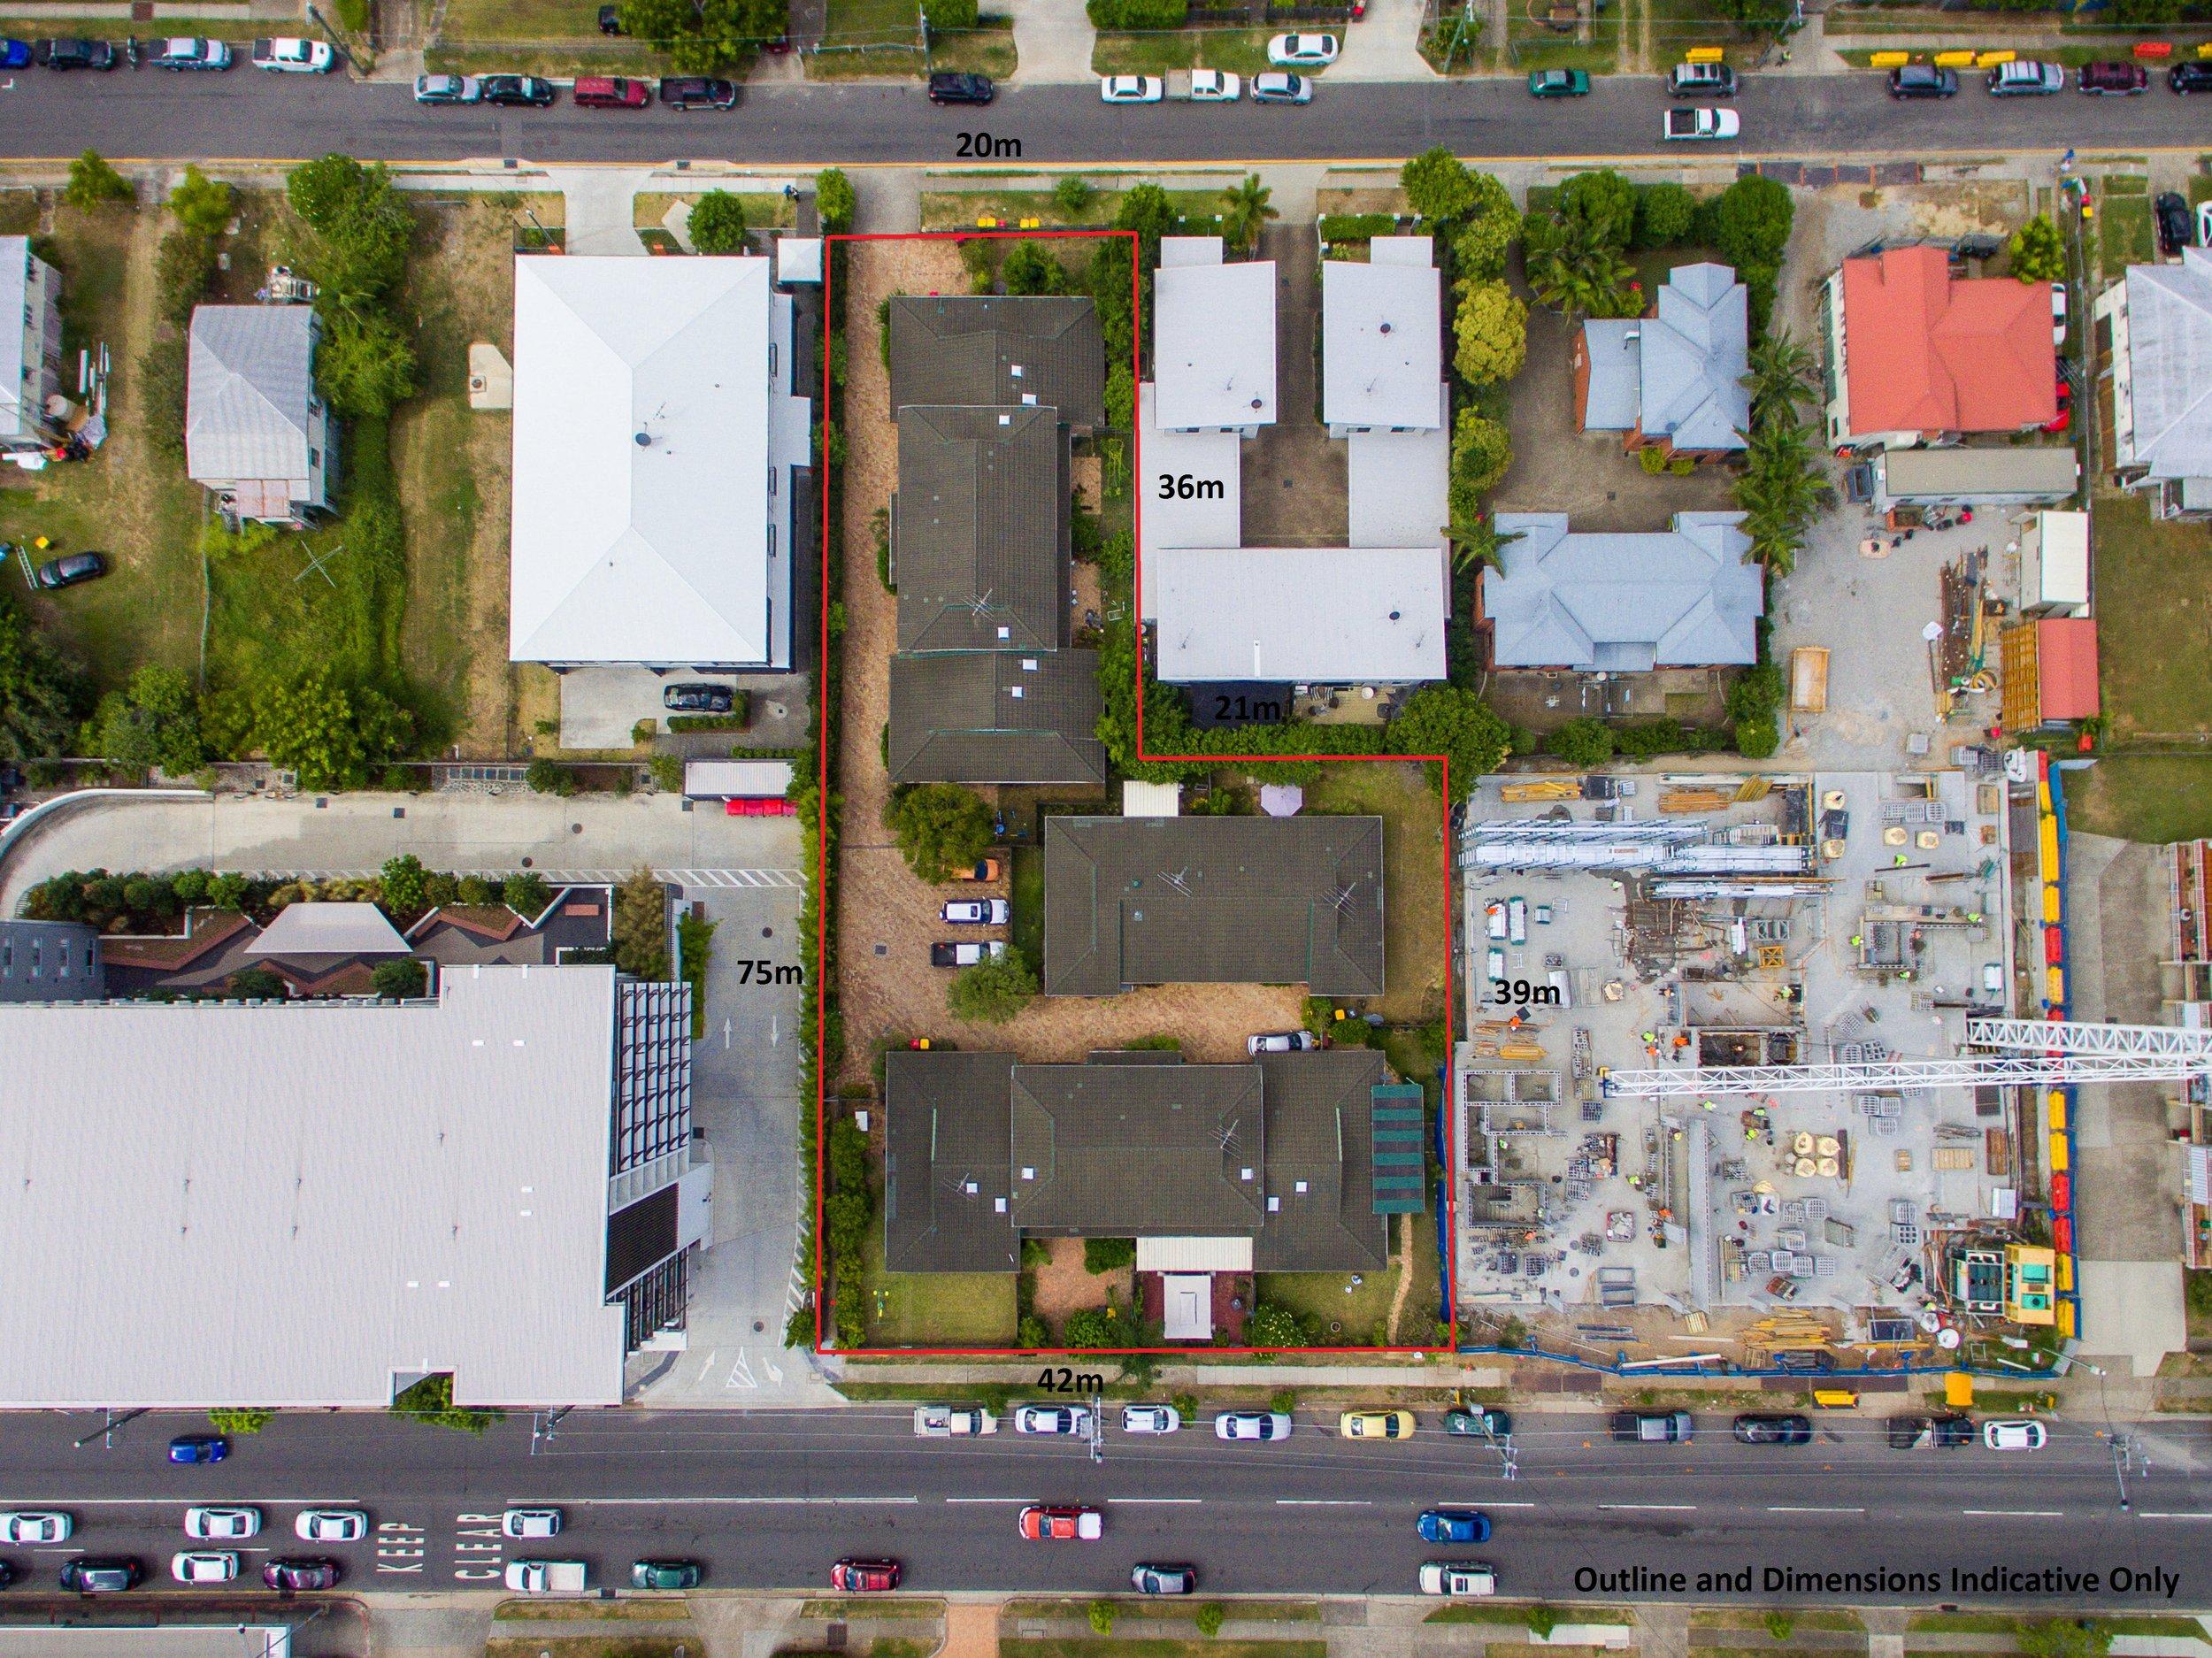 23_latham_st-aerial dimensions.jpg